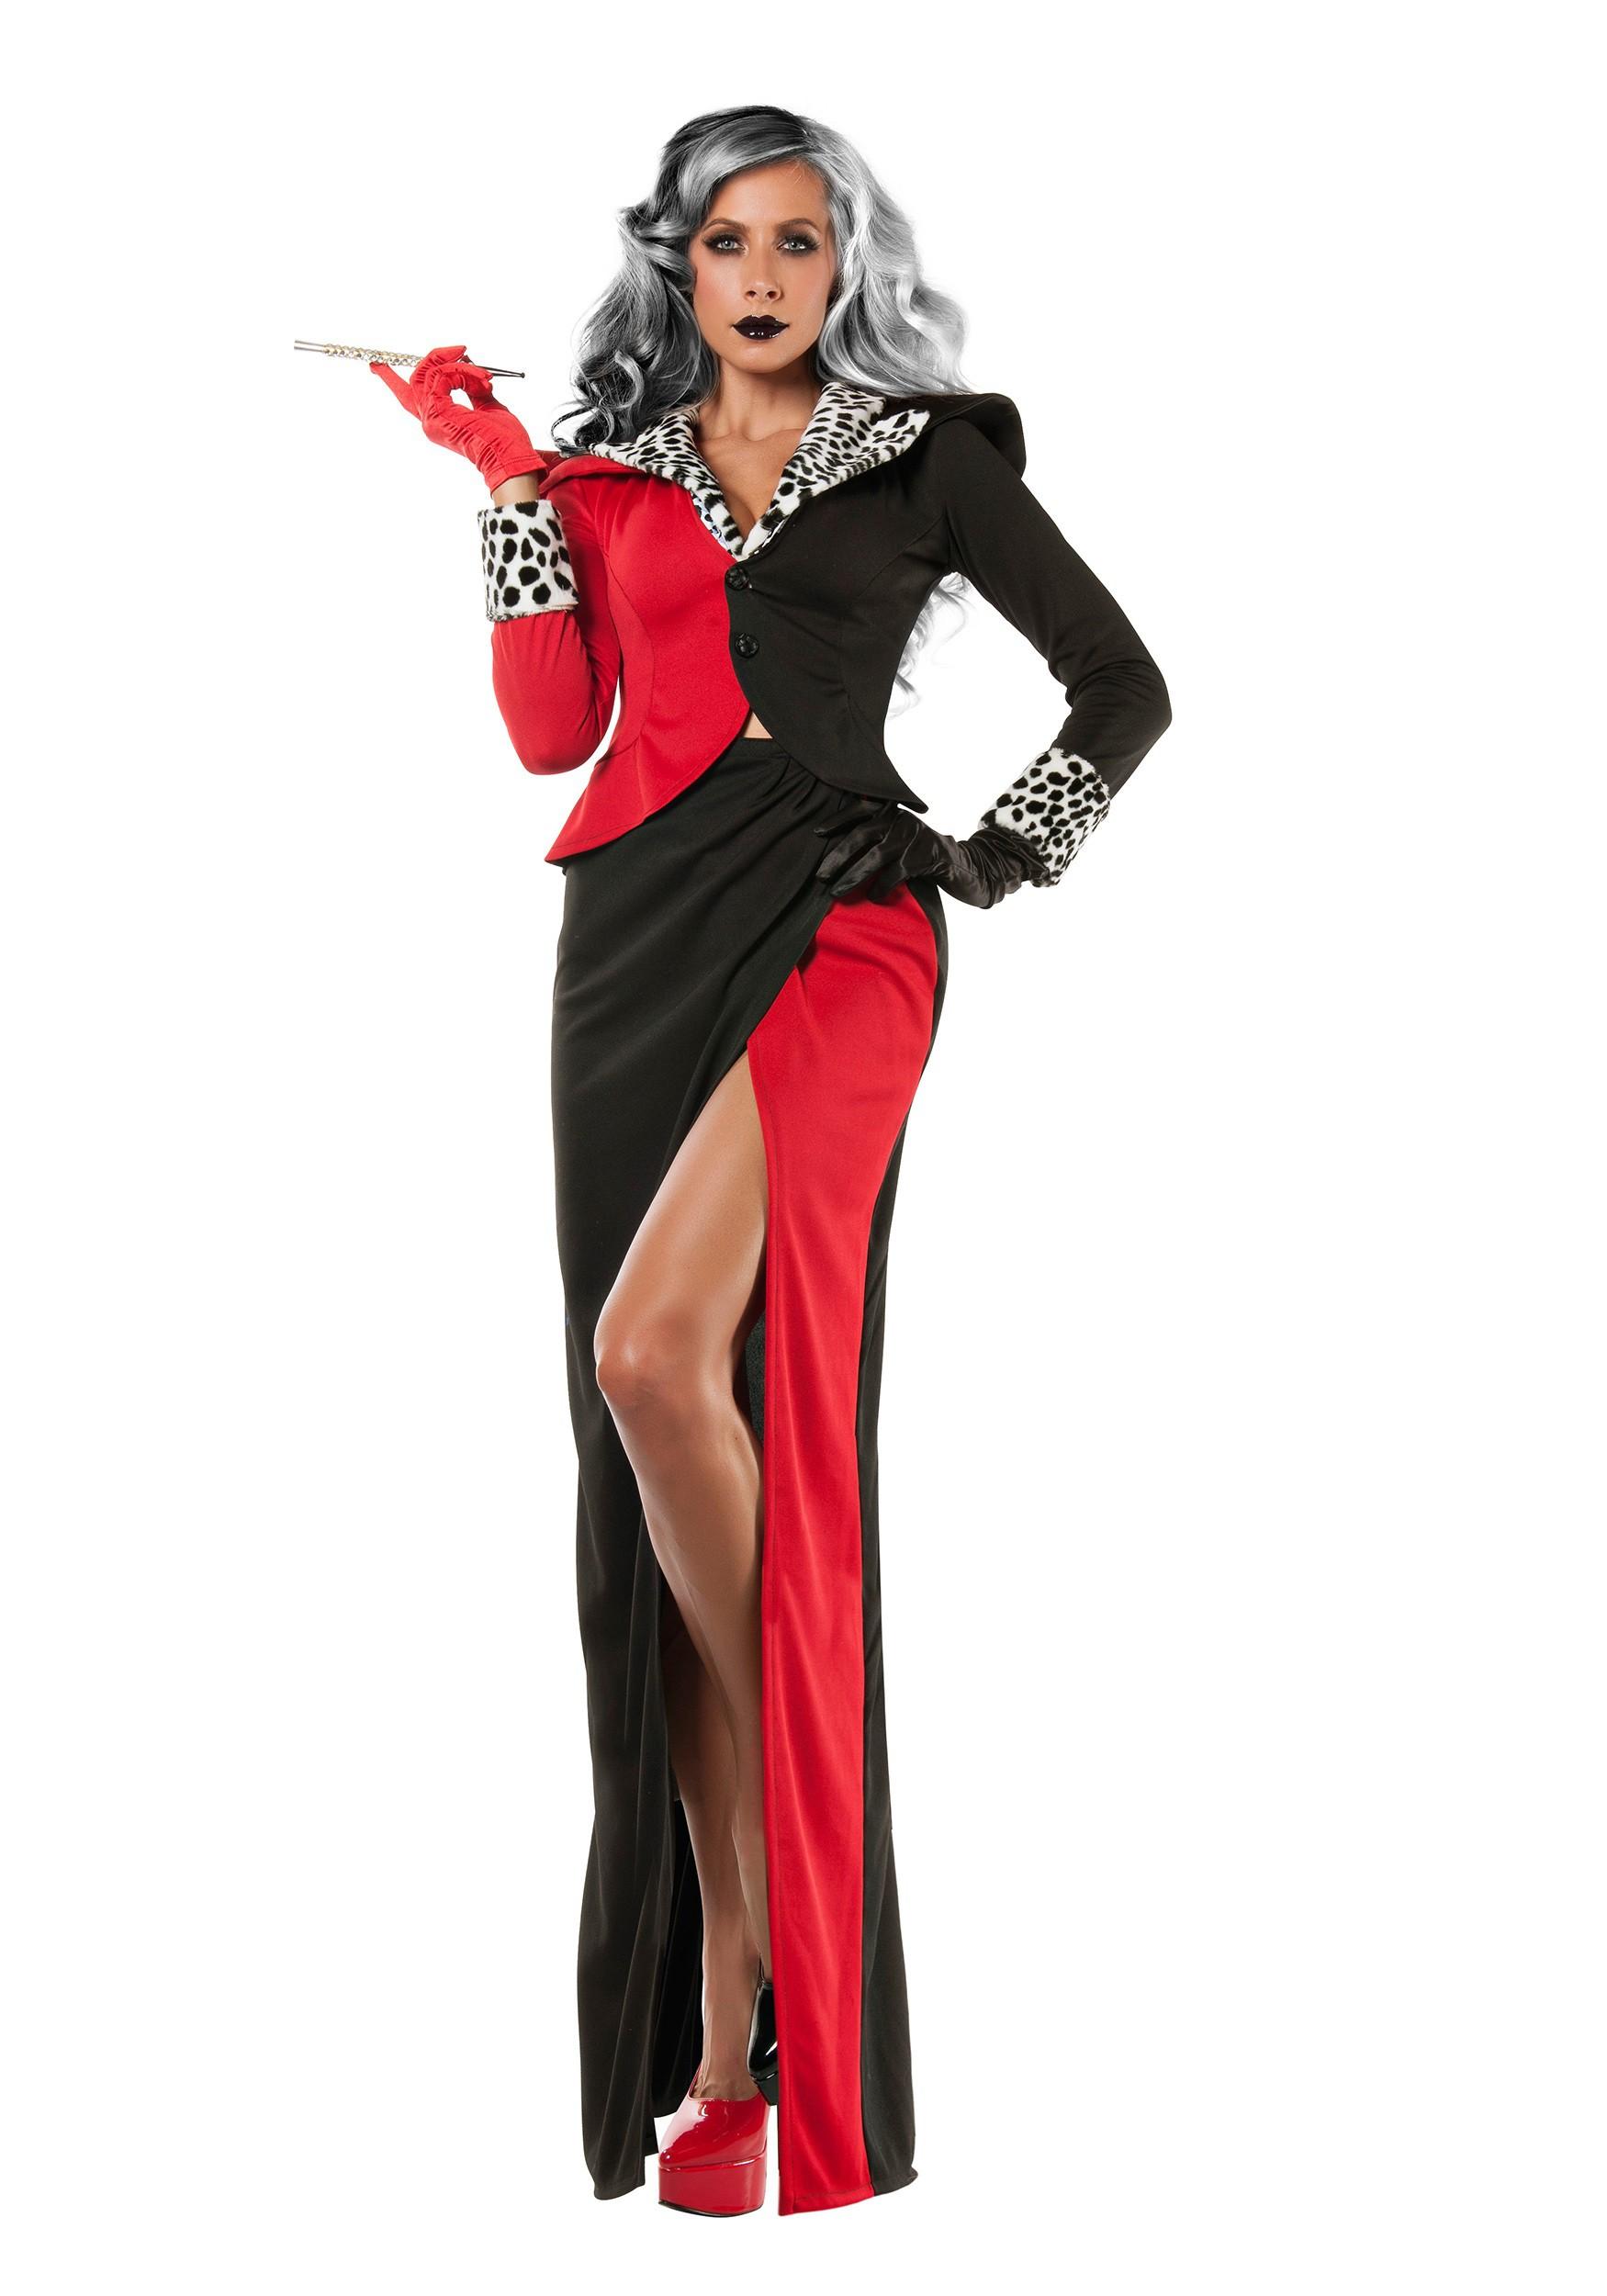 women 39 s cruel boss lady costume. Black Bedroom Furniture Sets. Home Design Ideas